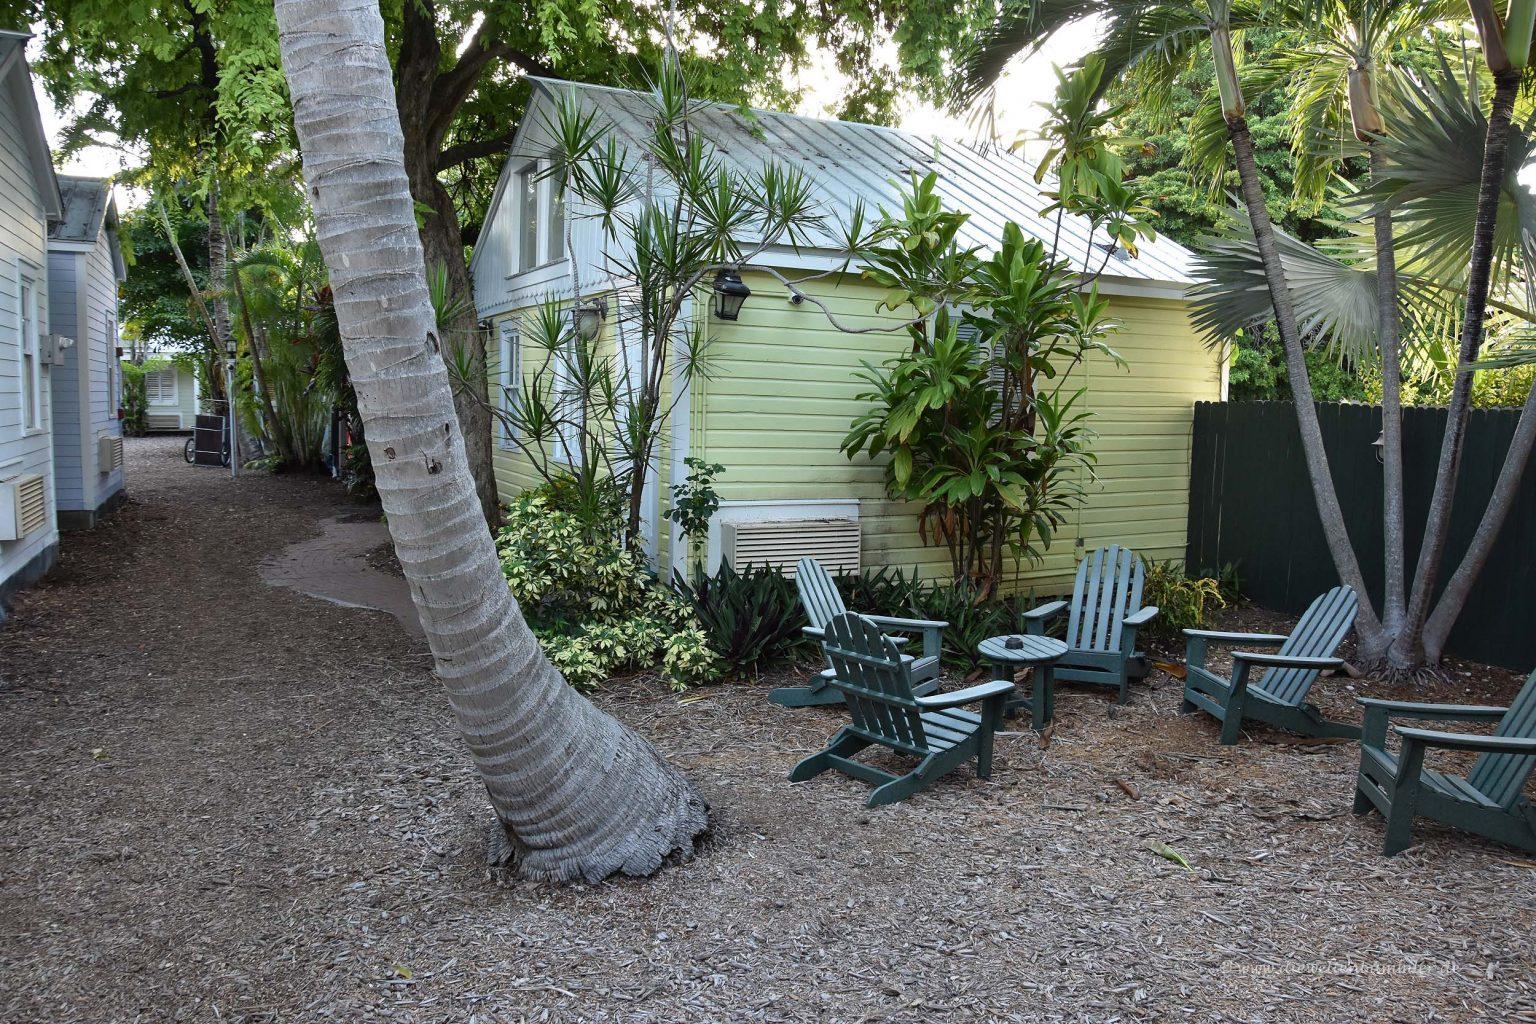 Key Lime Inn in Key West